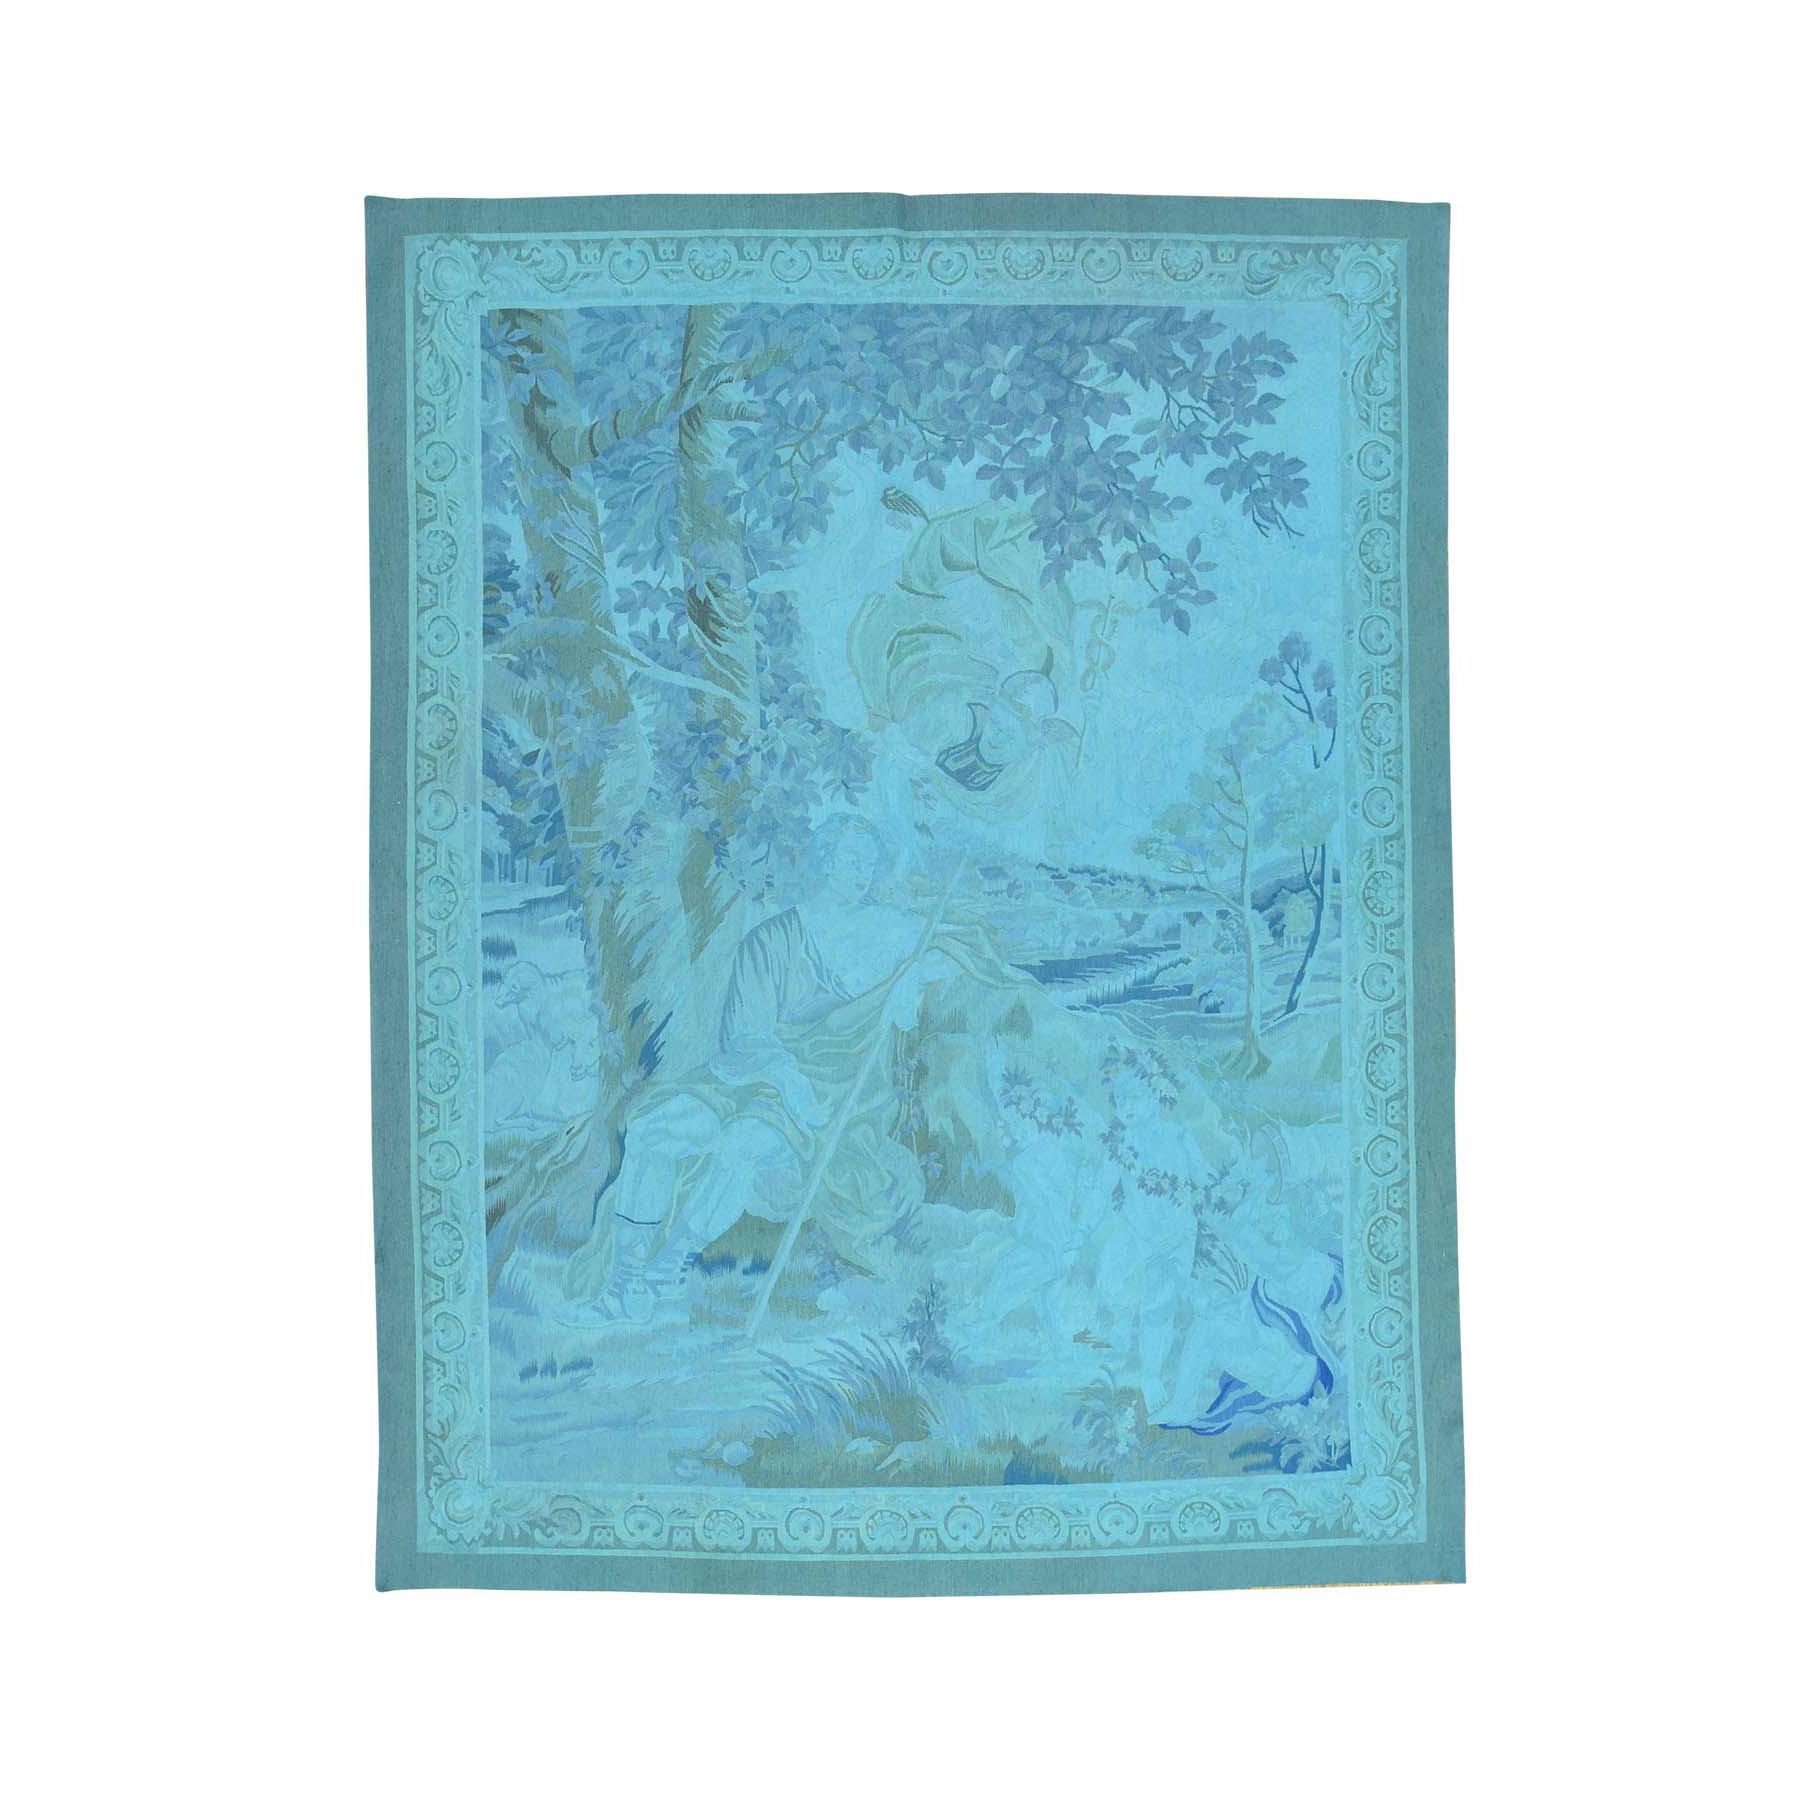 Elegant European Collection Hand Woven Blue Rug No: 163846